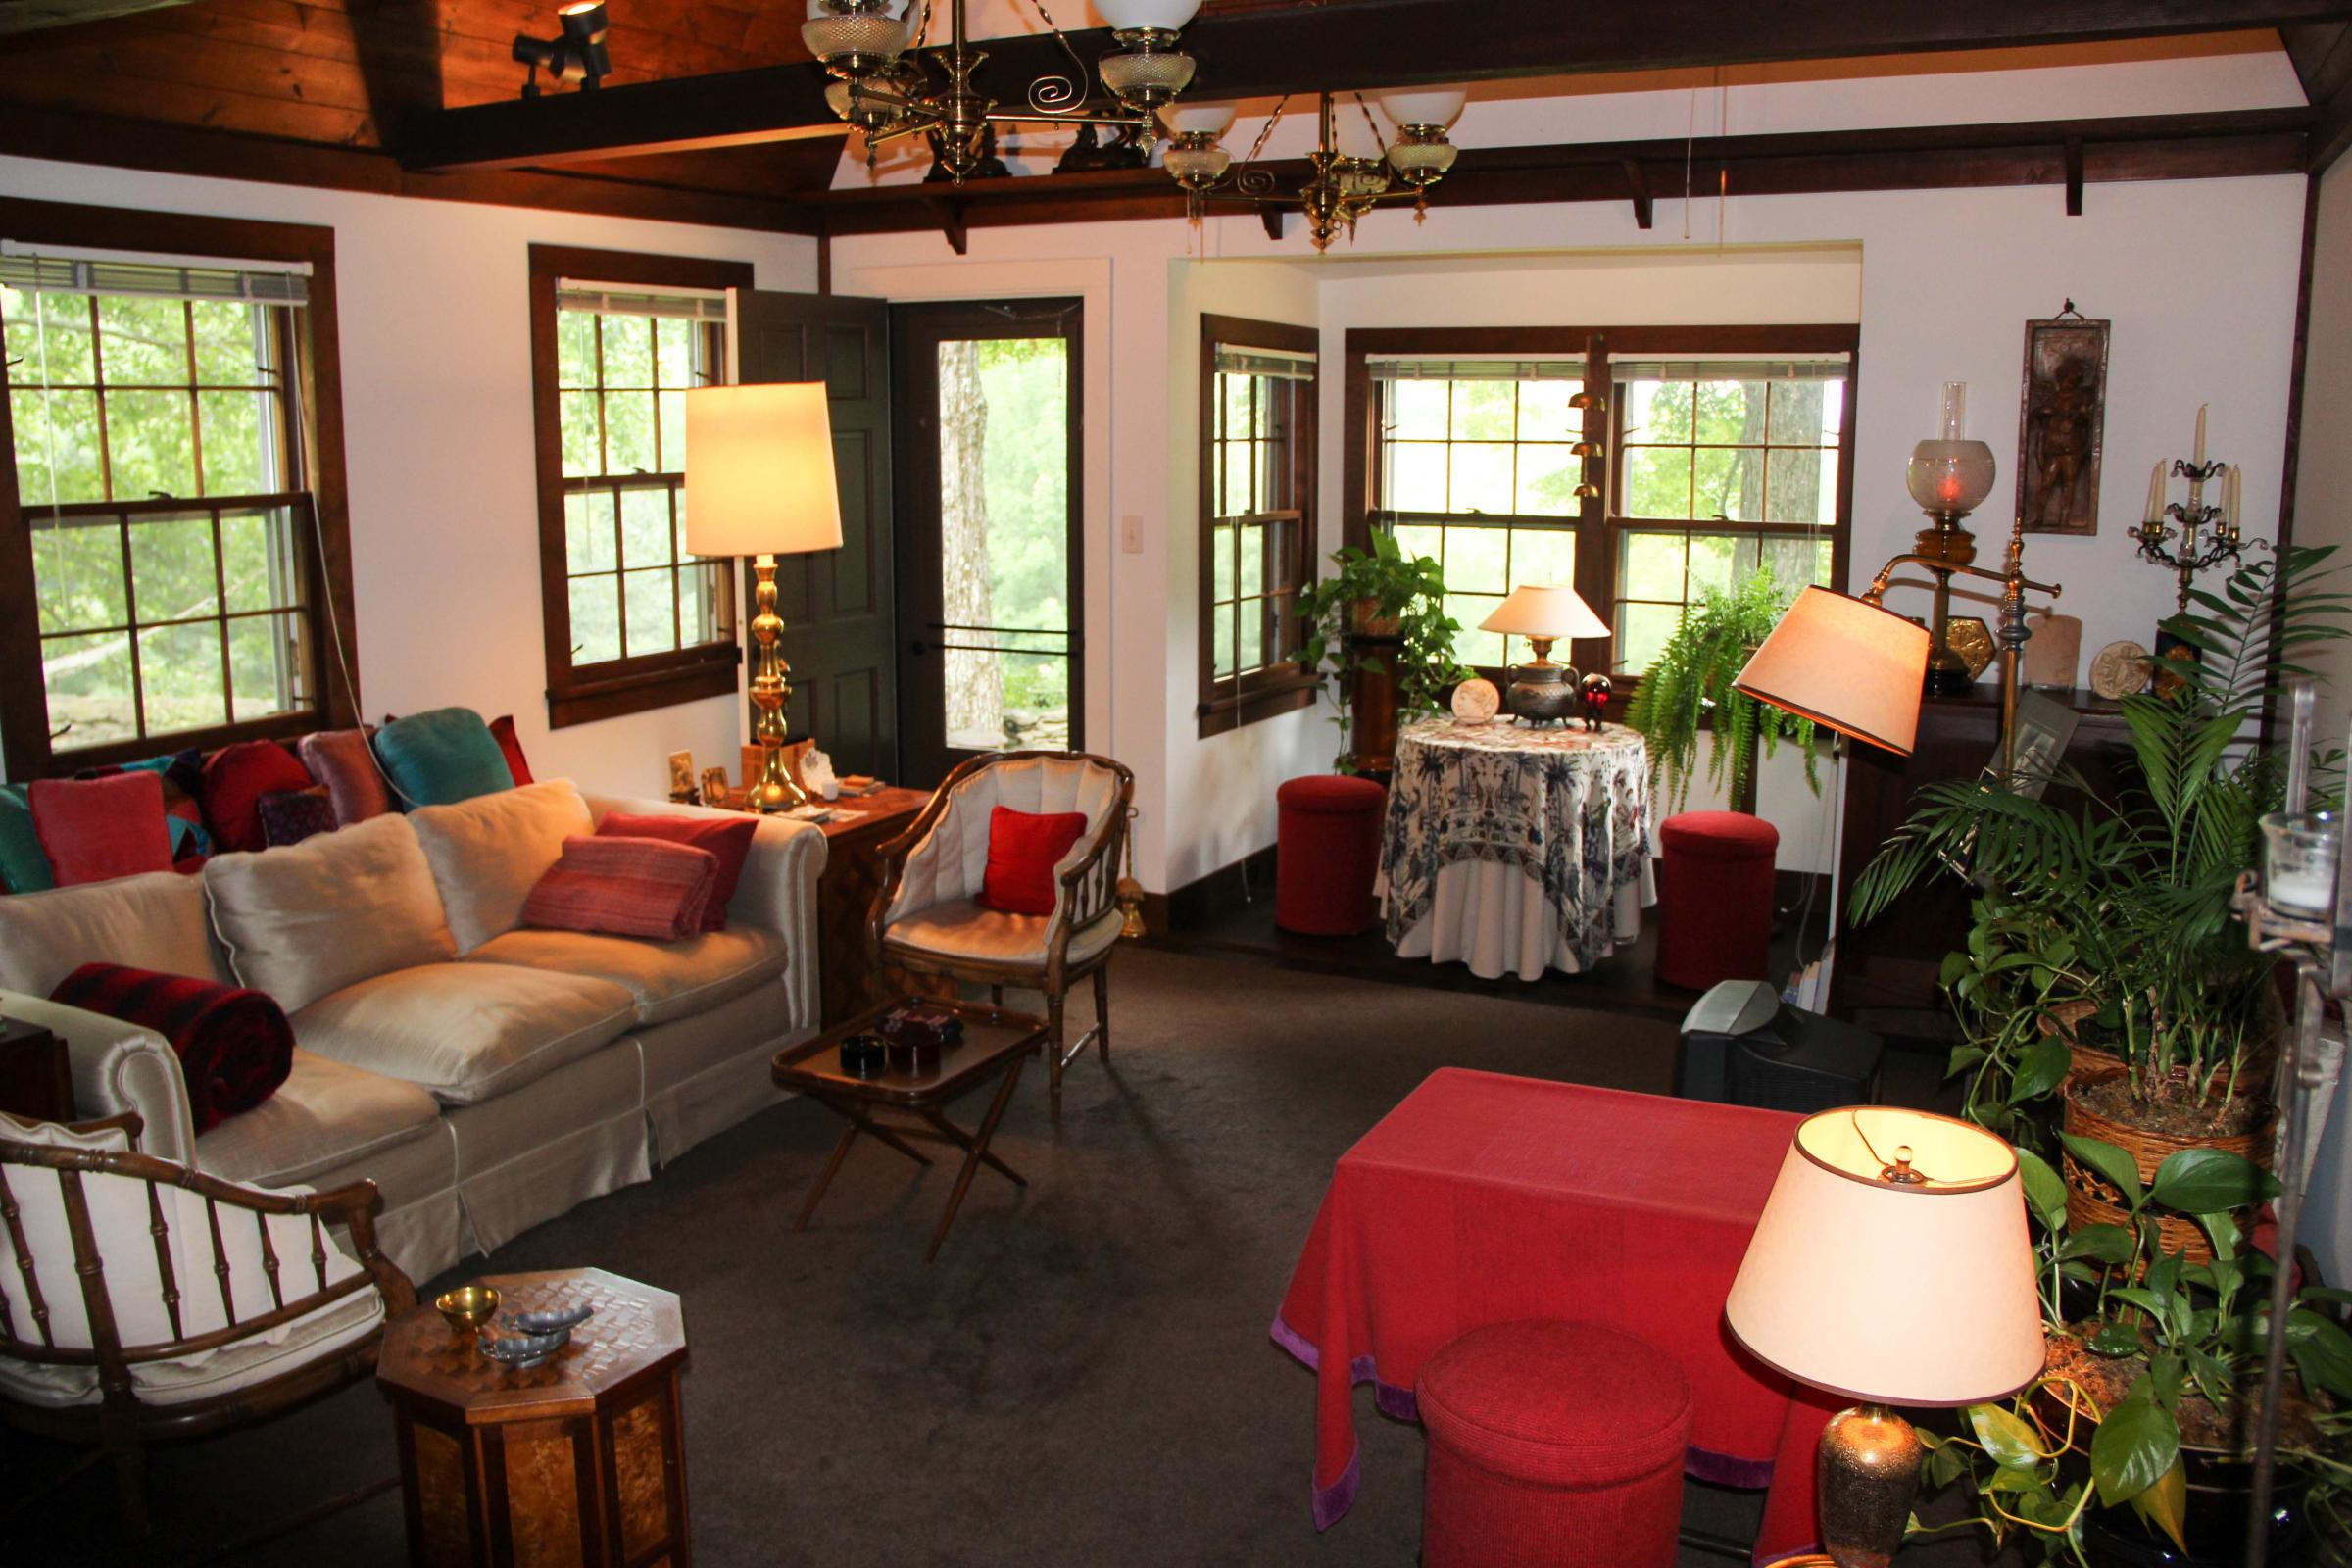 Inside The Main Room Of Original Cottage